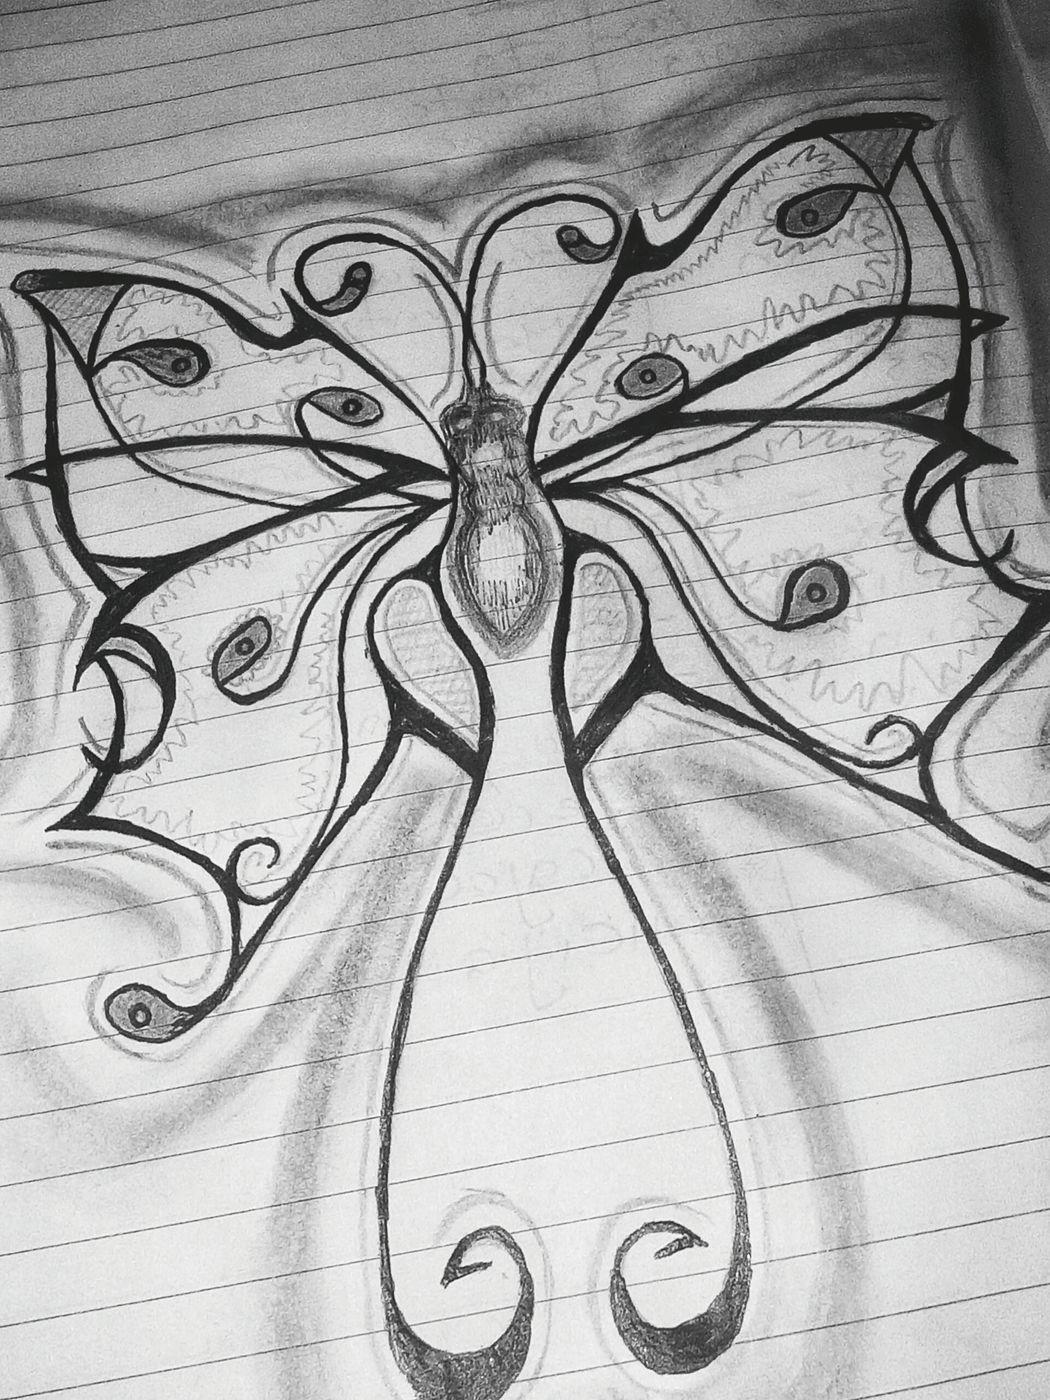 Little art of my Art Love Art♥ ArtWork Artphoto Art, Drawing, Creativity Blackandwhite Artistic Photography Blackandwhite Photography Europe Love Life ❤ Bosnian  Photoshoot Happy :) Inspired Relaxing My Hand  Buterfly Buterfly Tattoo